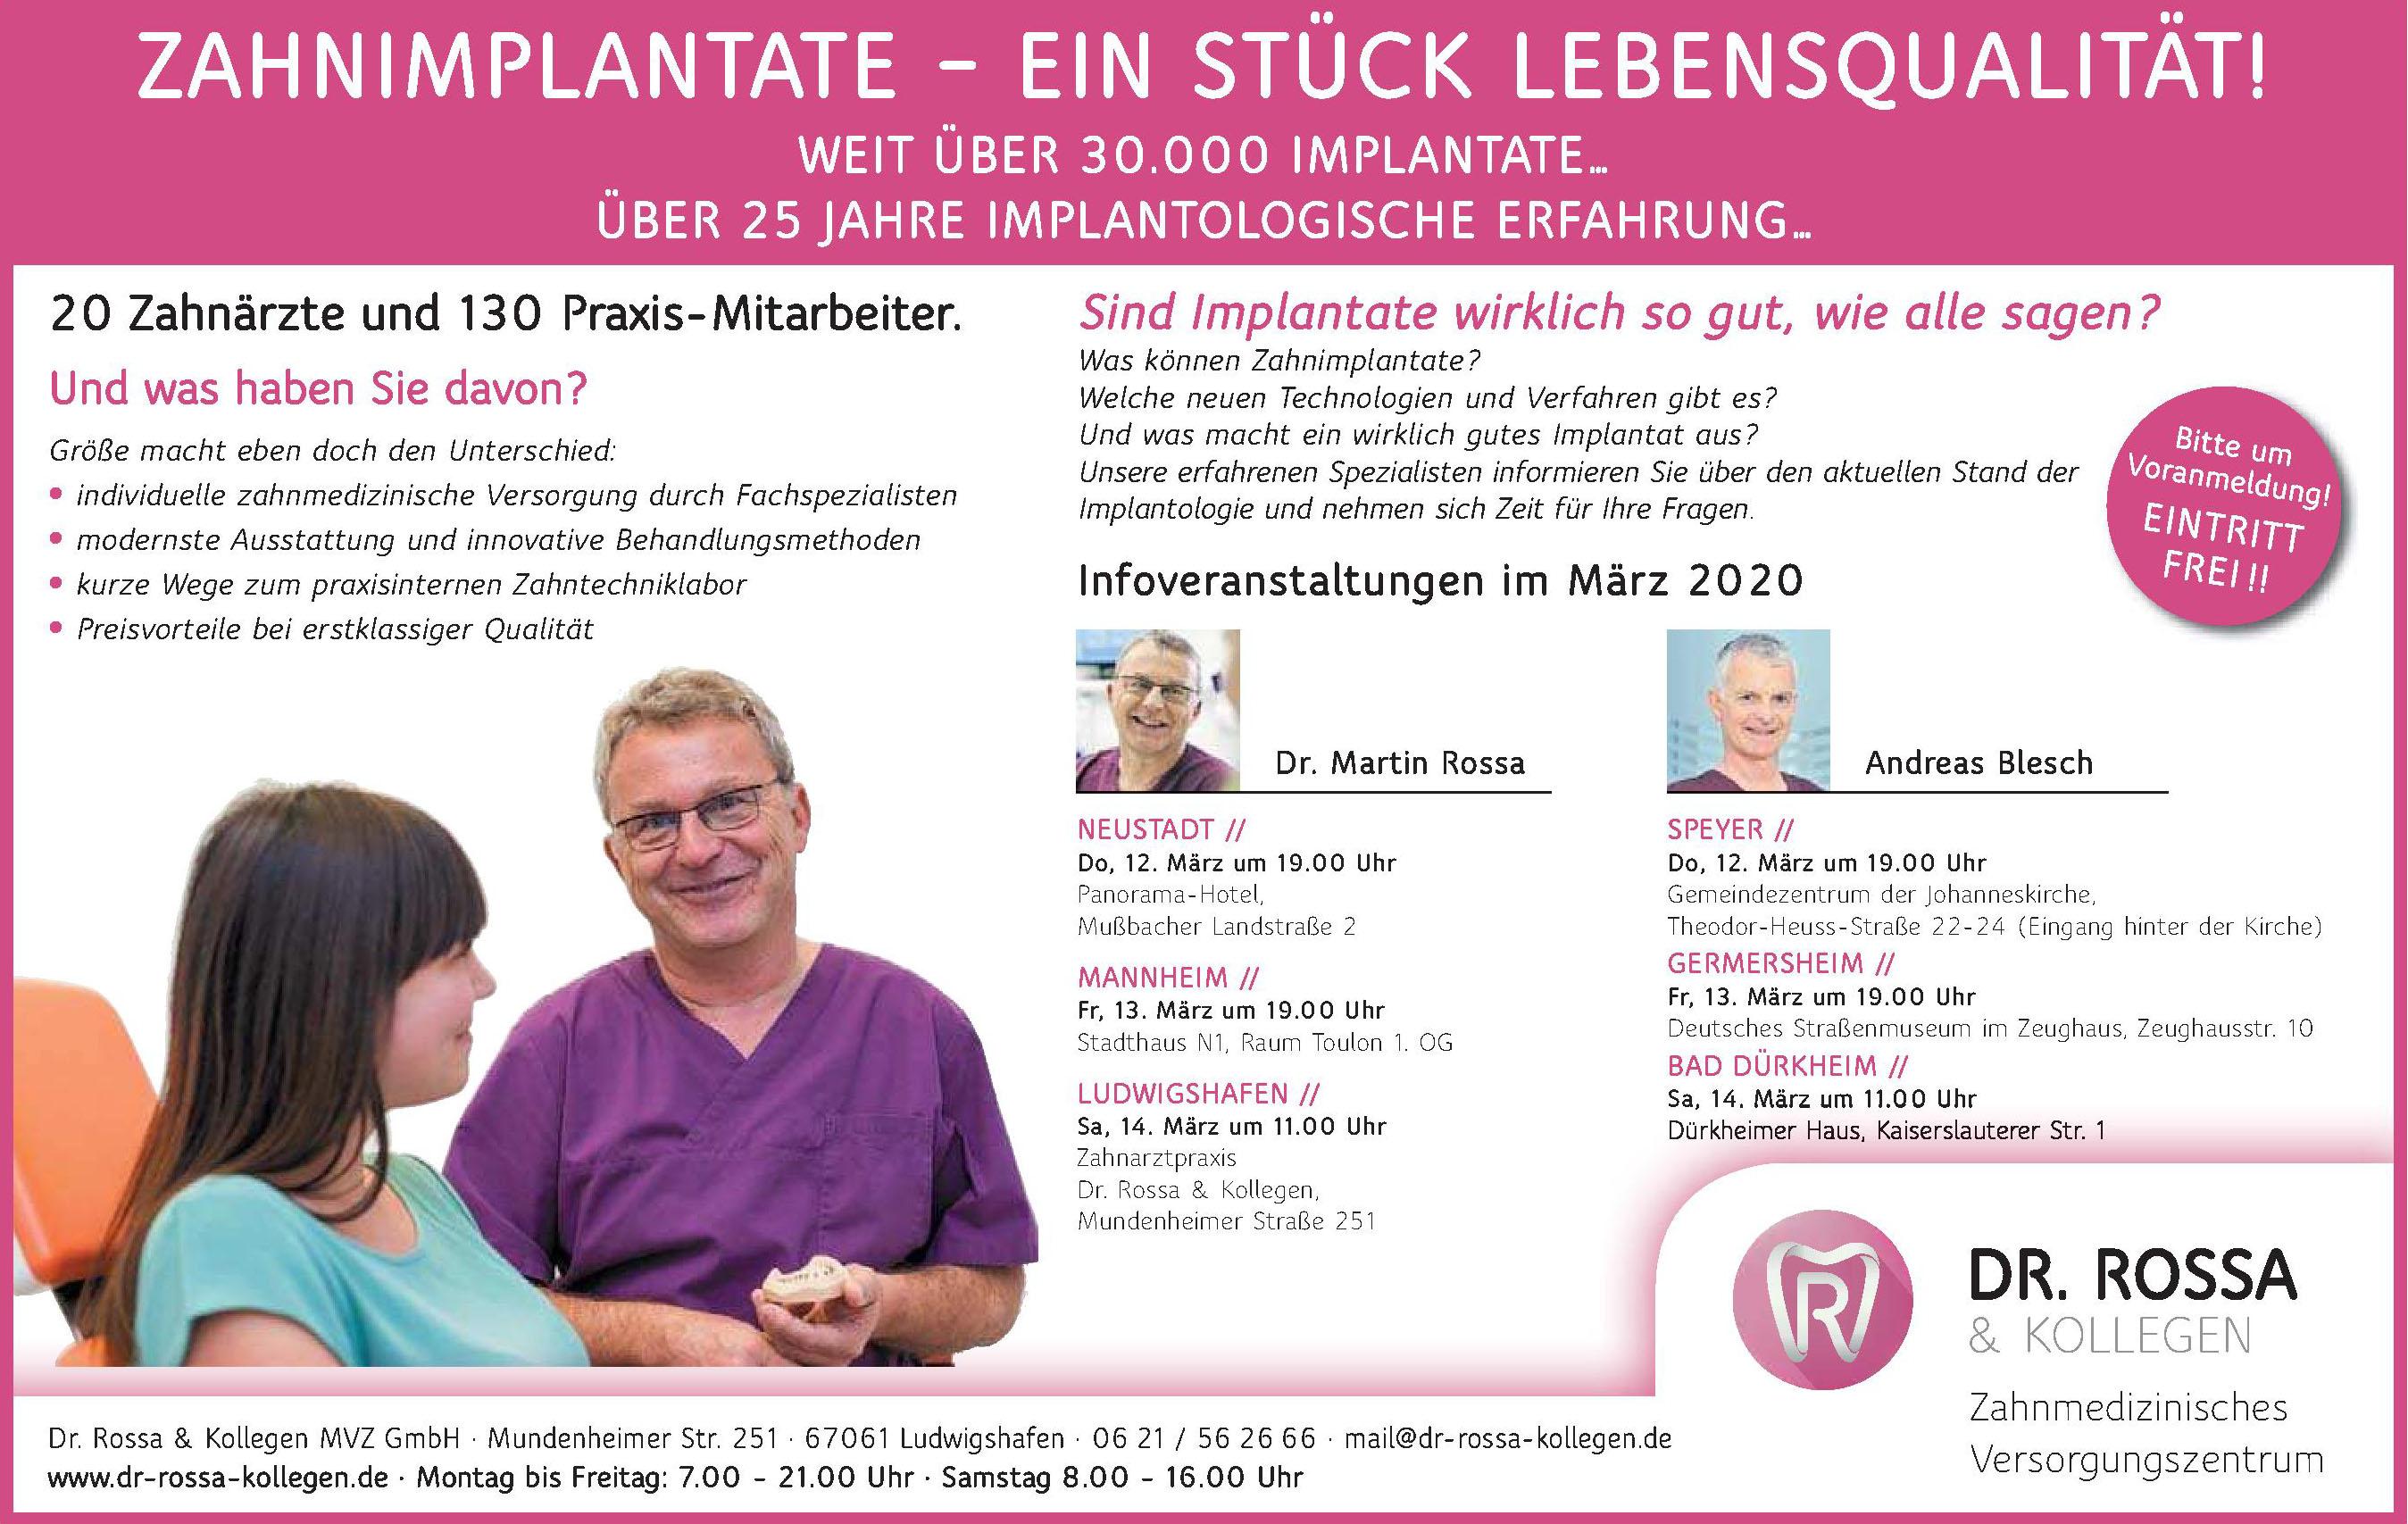 Dr. Rossa & Kollegen MVZ GmbH